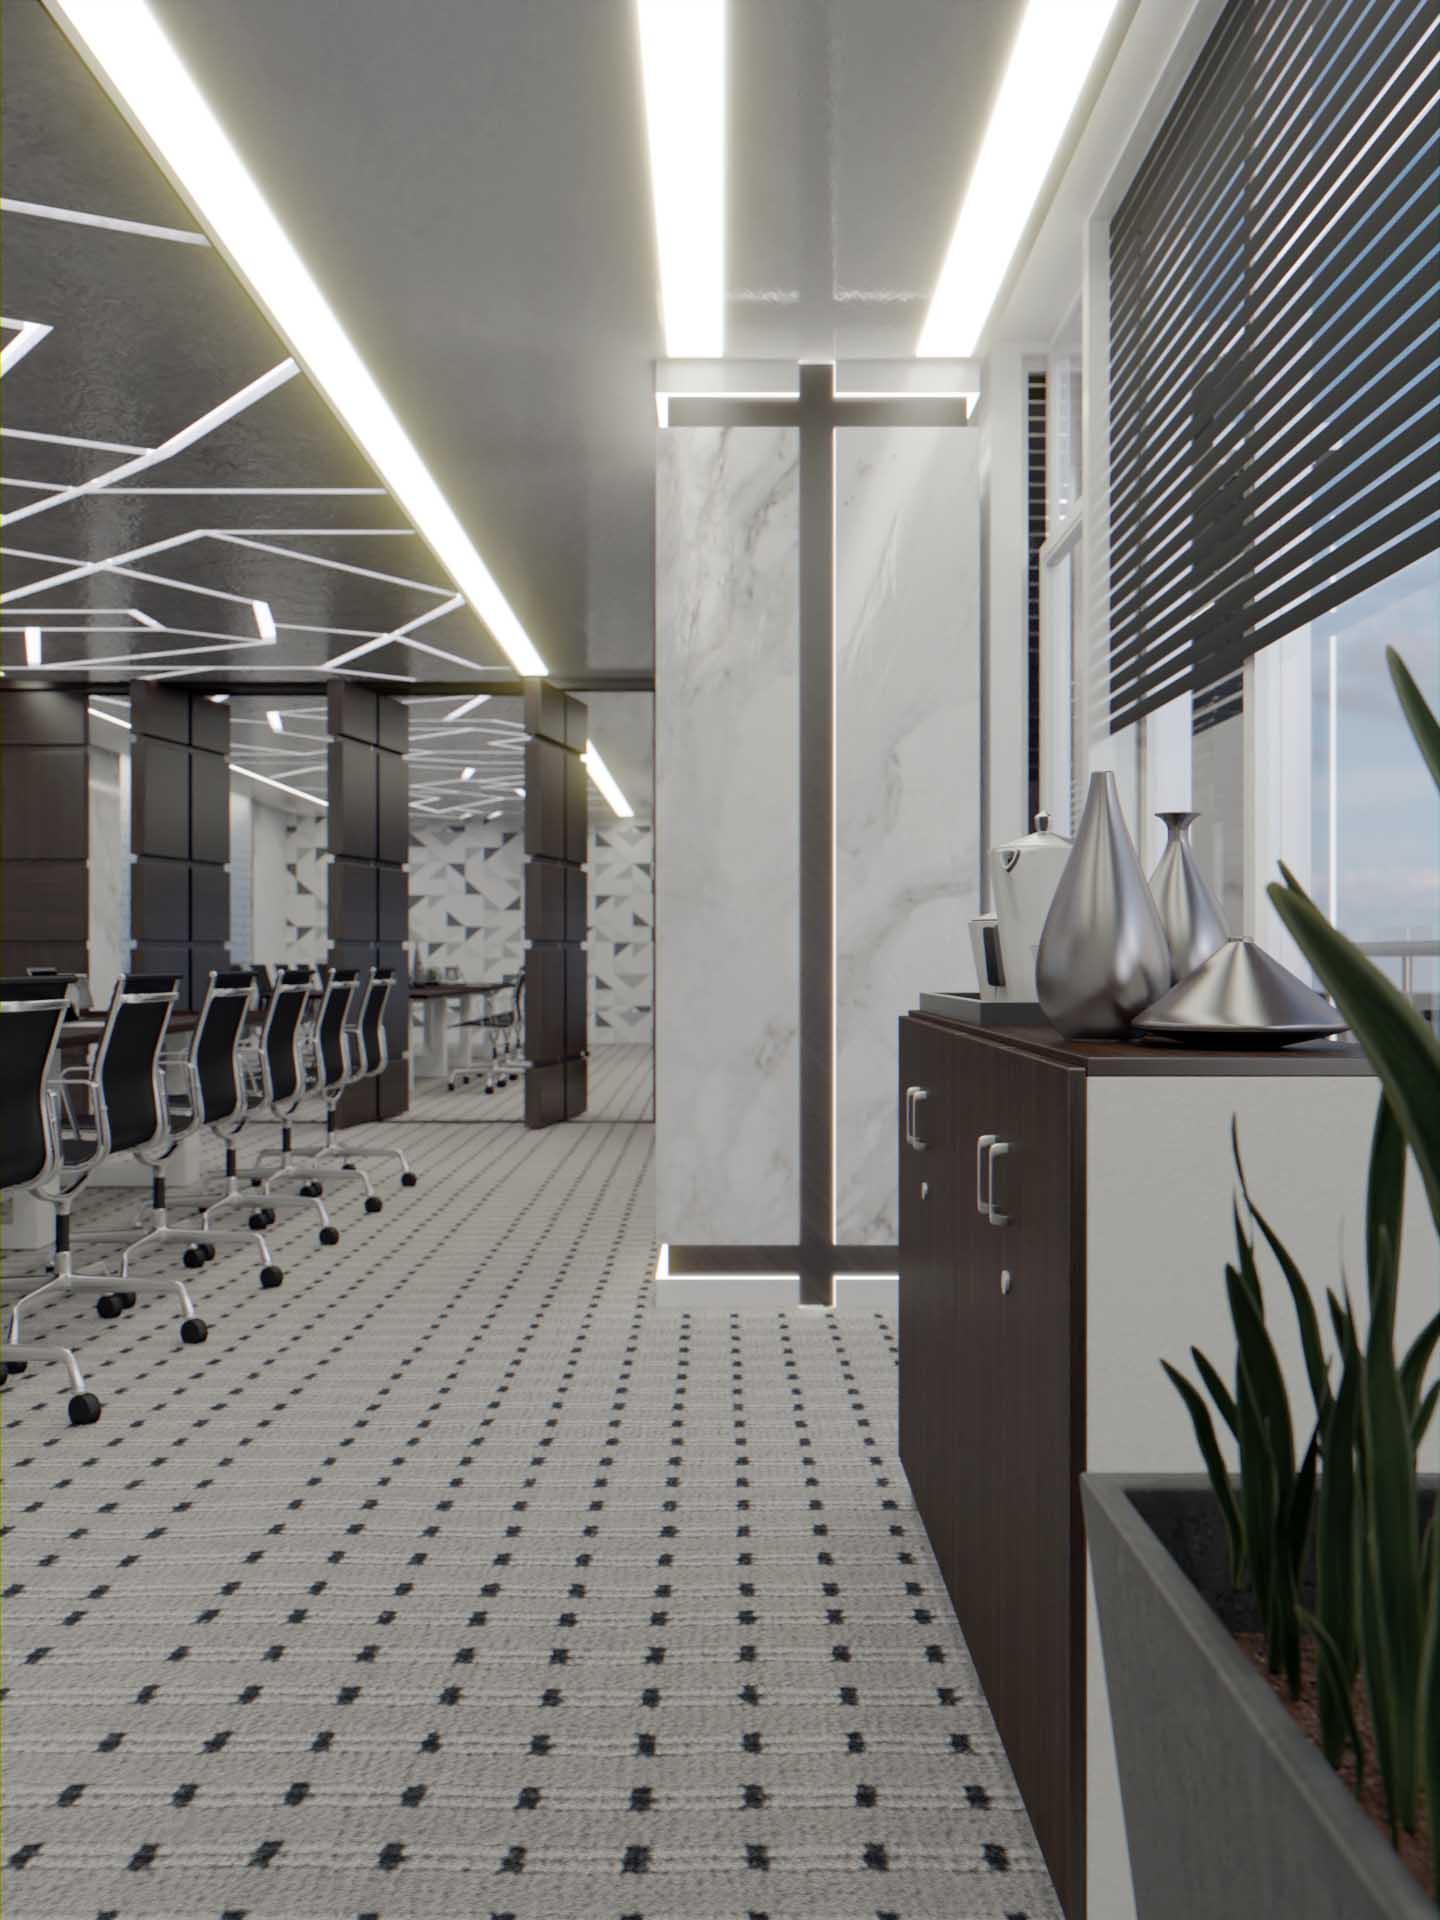 Coffeestation_Ramco_Serenity interiors